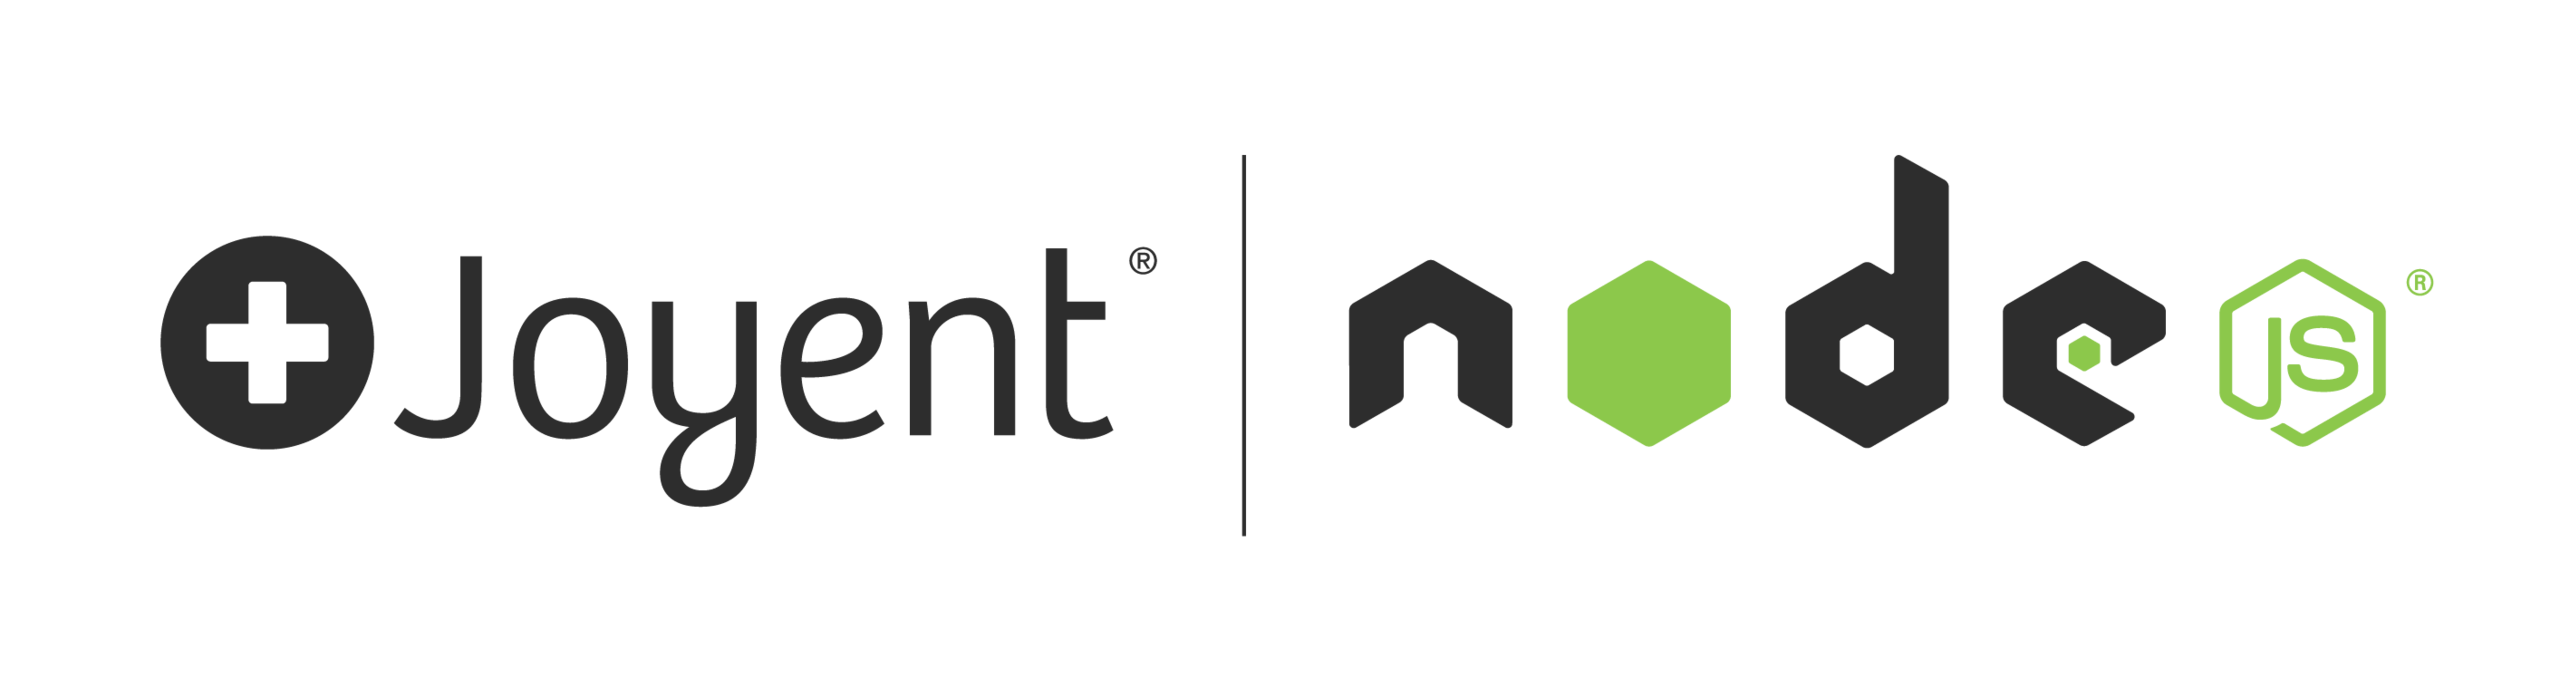 joyent-node-light.png